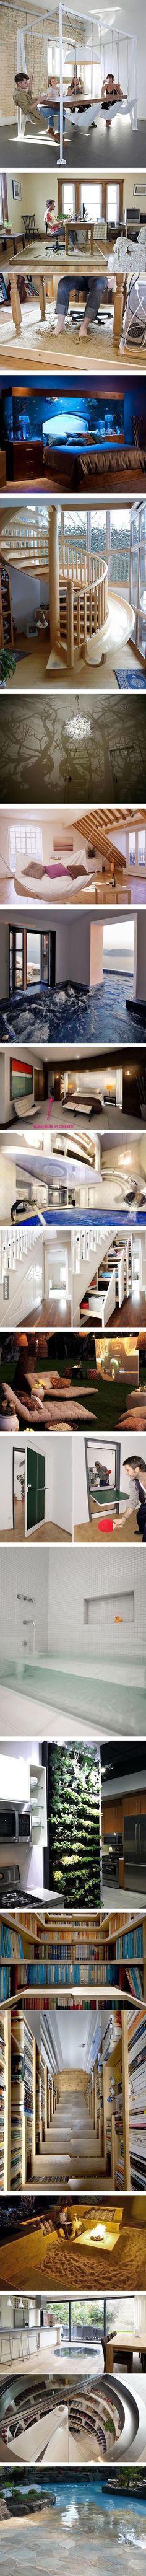 Um yes please Especially the shoe closet in the ground - interiors-designed.com